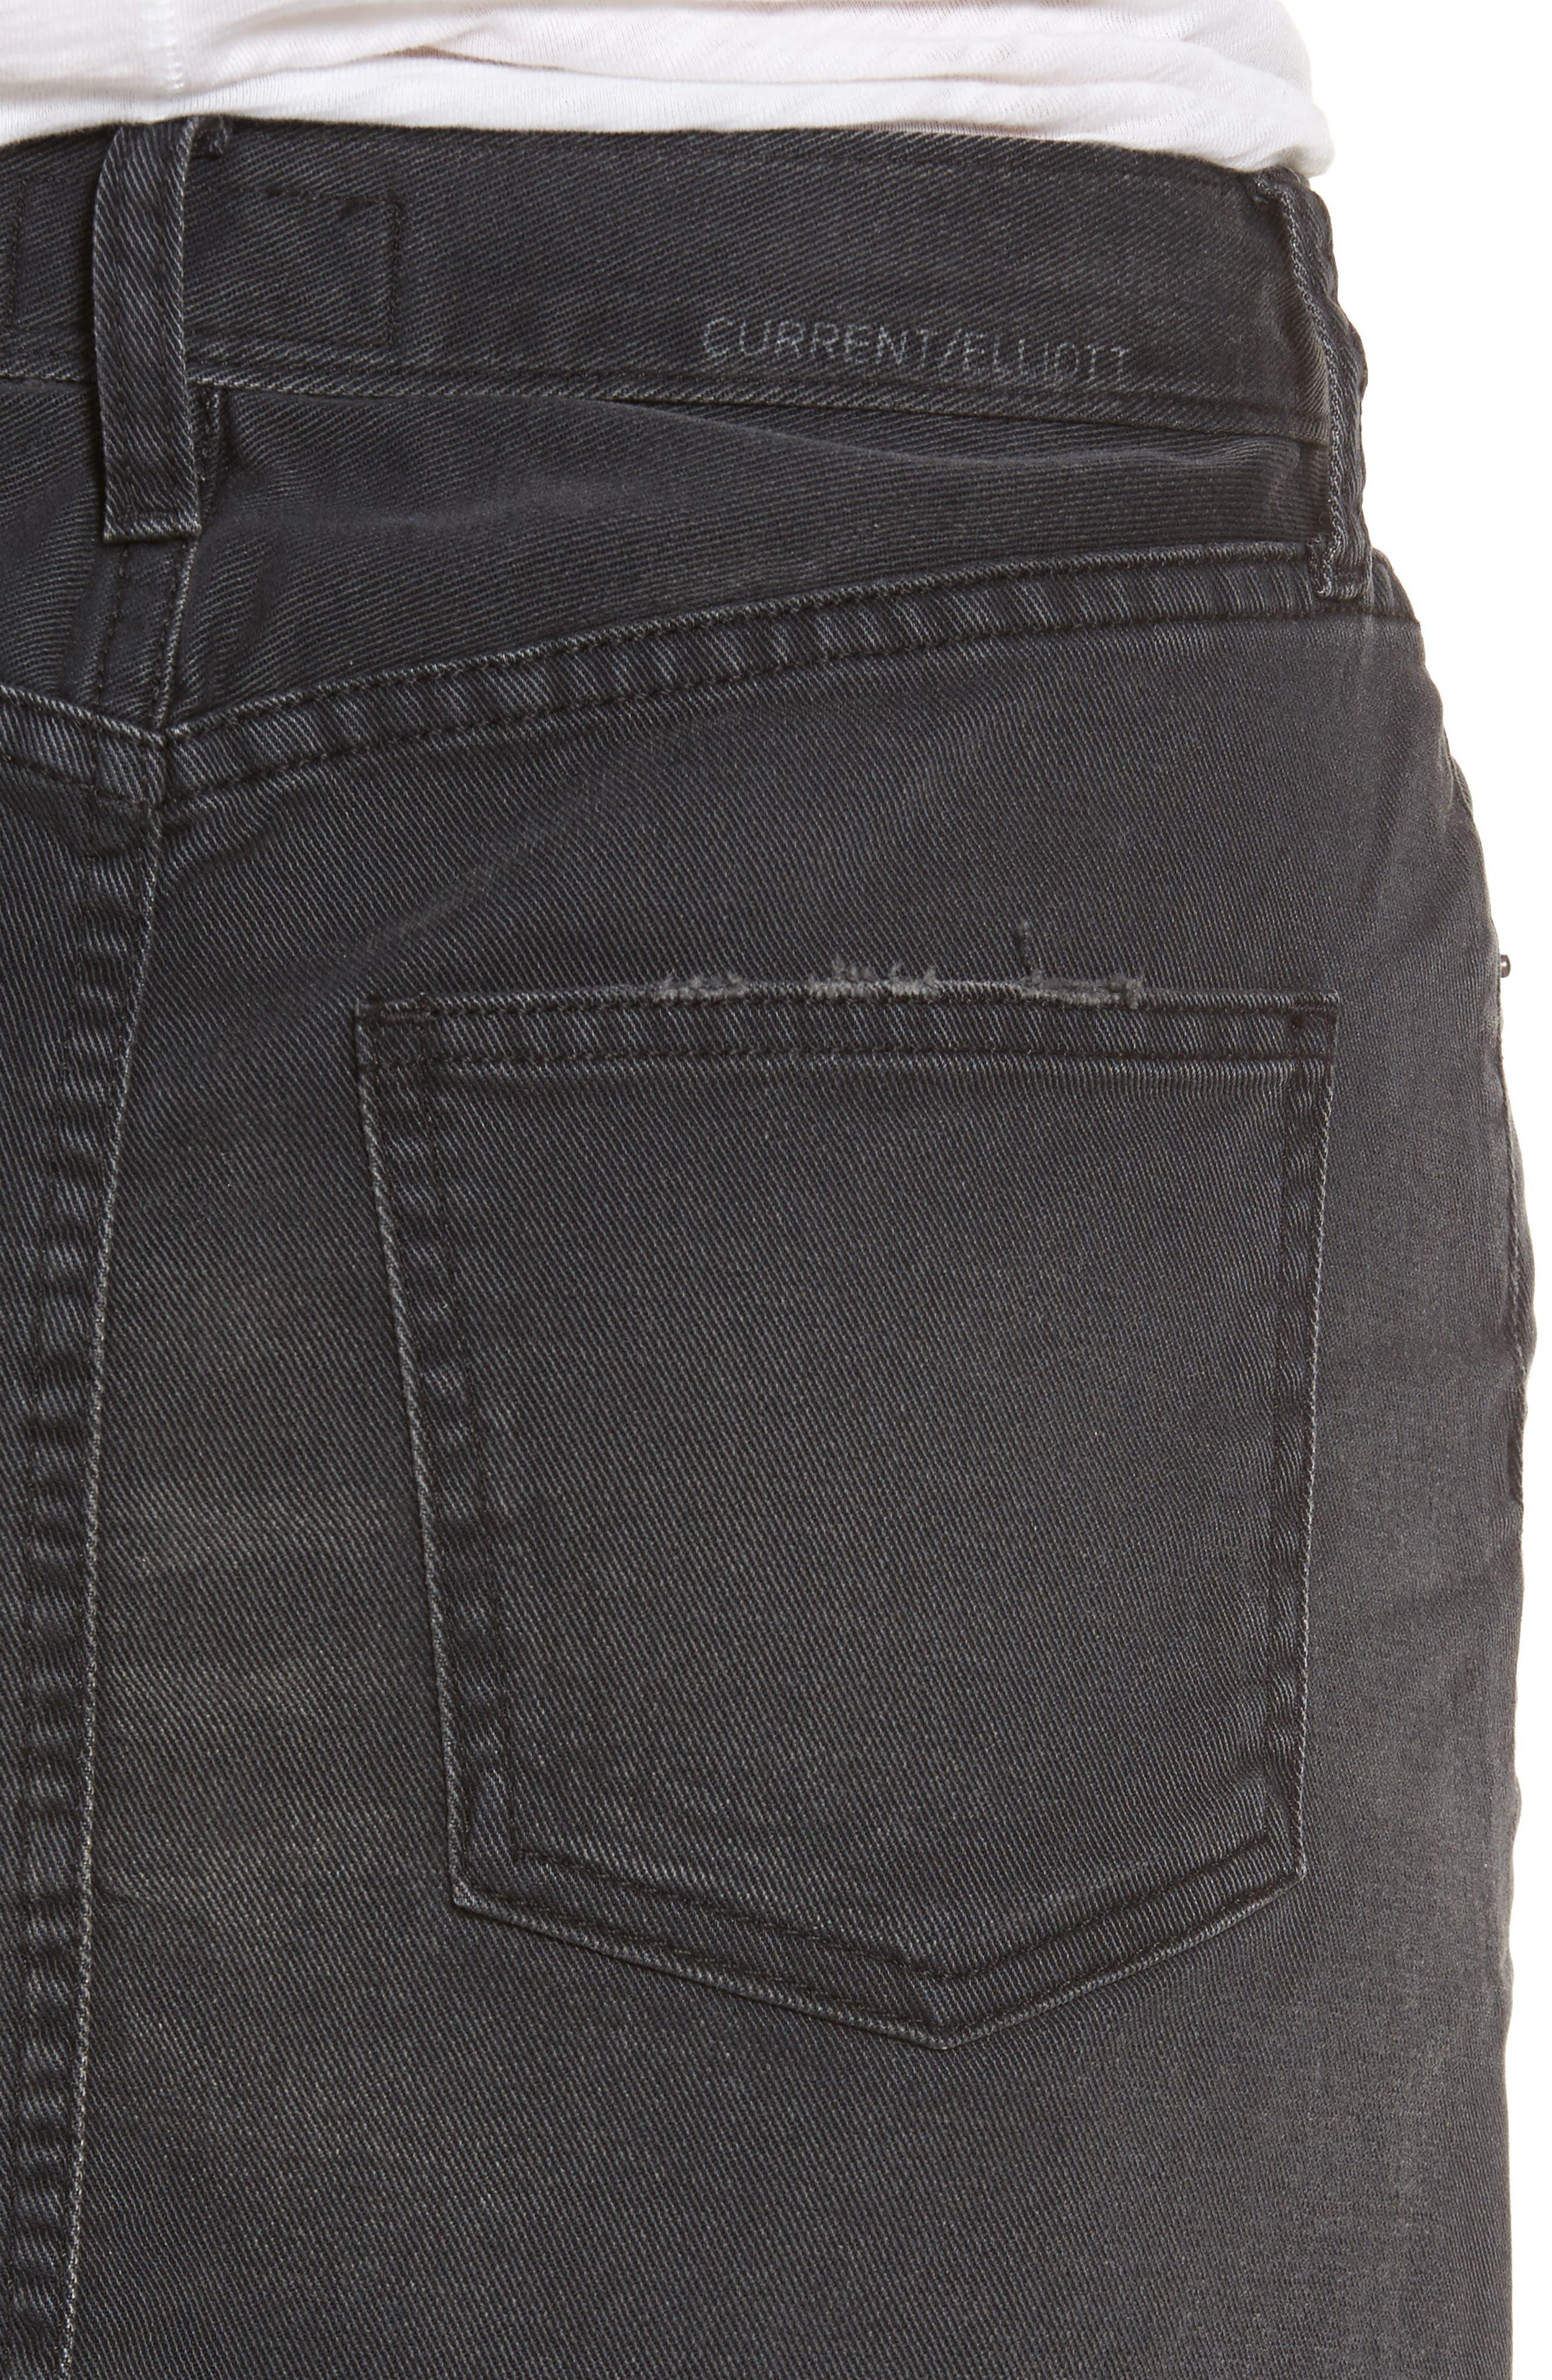 Cut Off Miniskirt,                             Alternate thumbnail 4, color,                             017